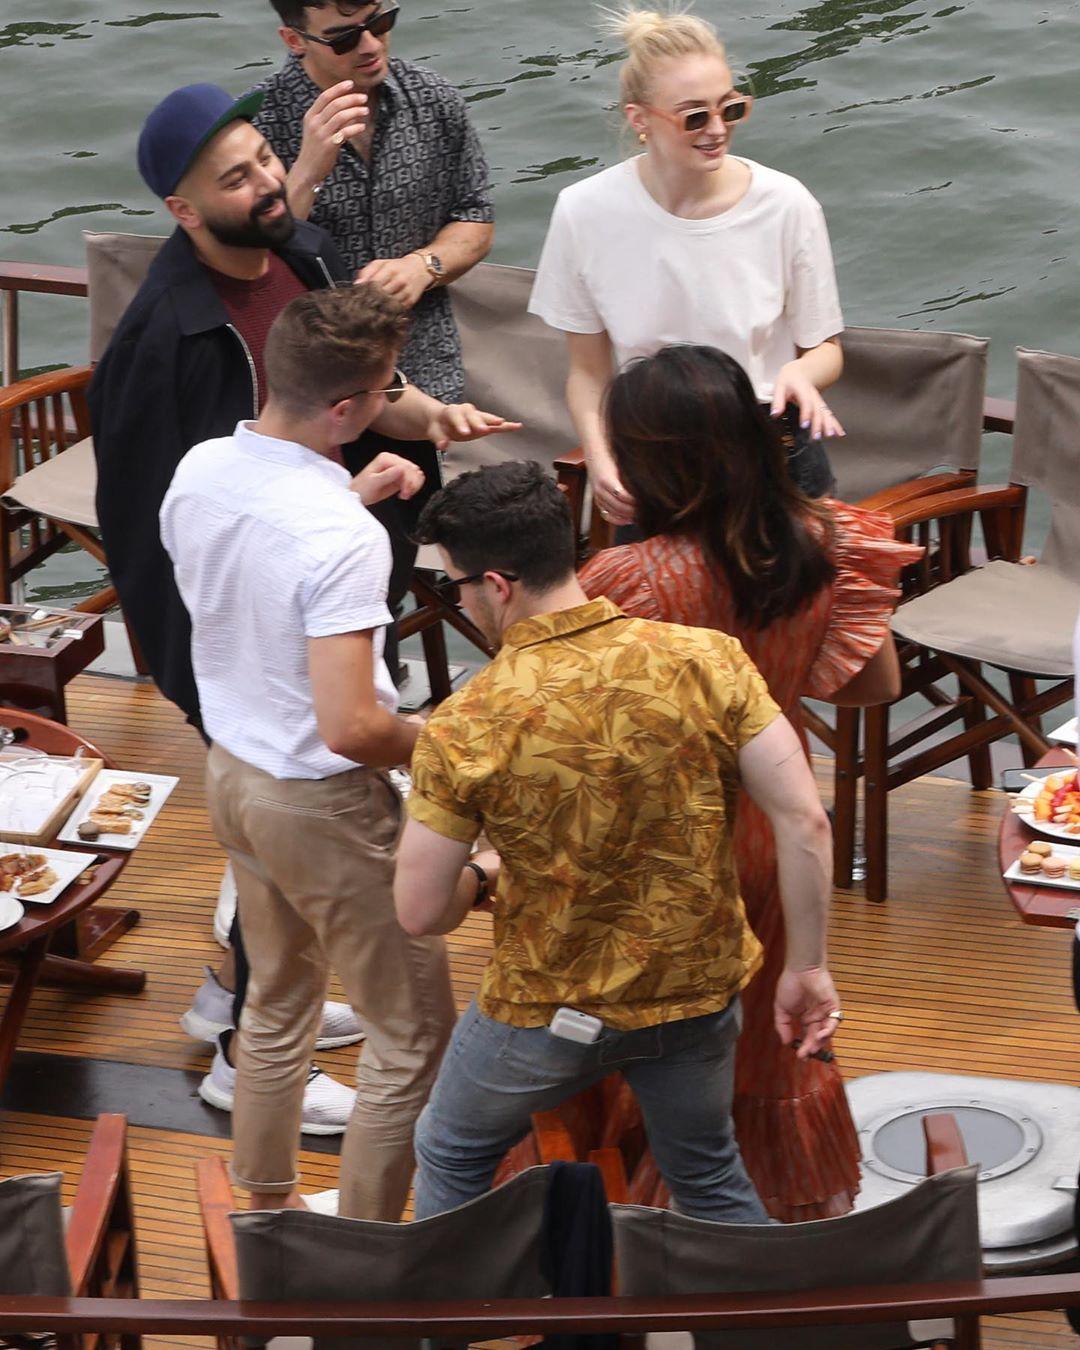 Priyanka Chopra And Nick Jonas' Pictures from the Jonas' Parisian Cruise Goes Viral